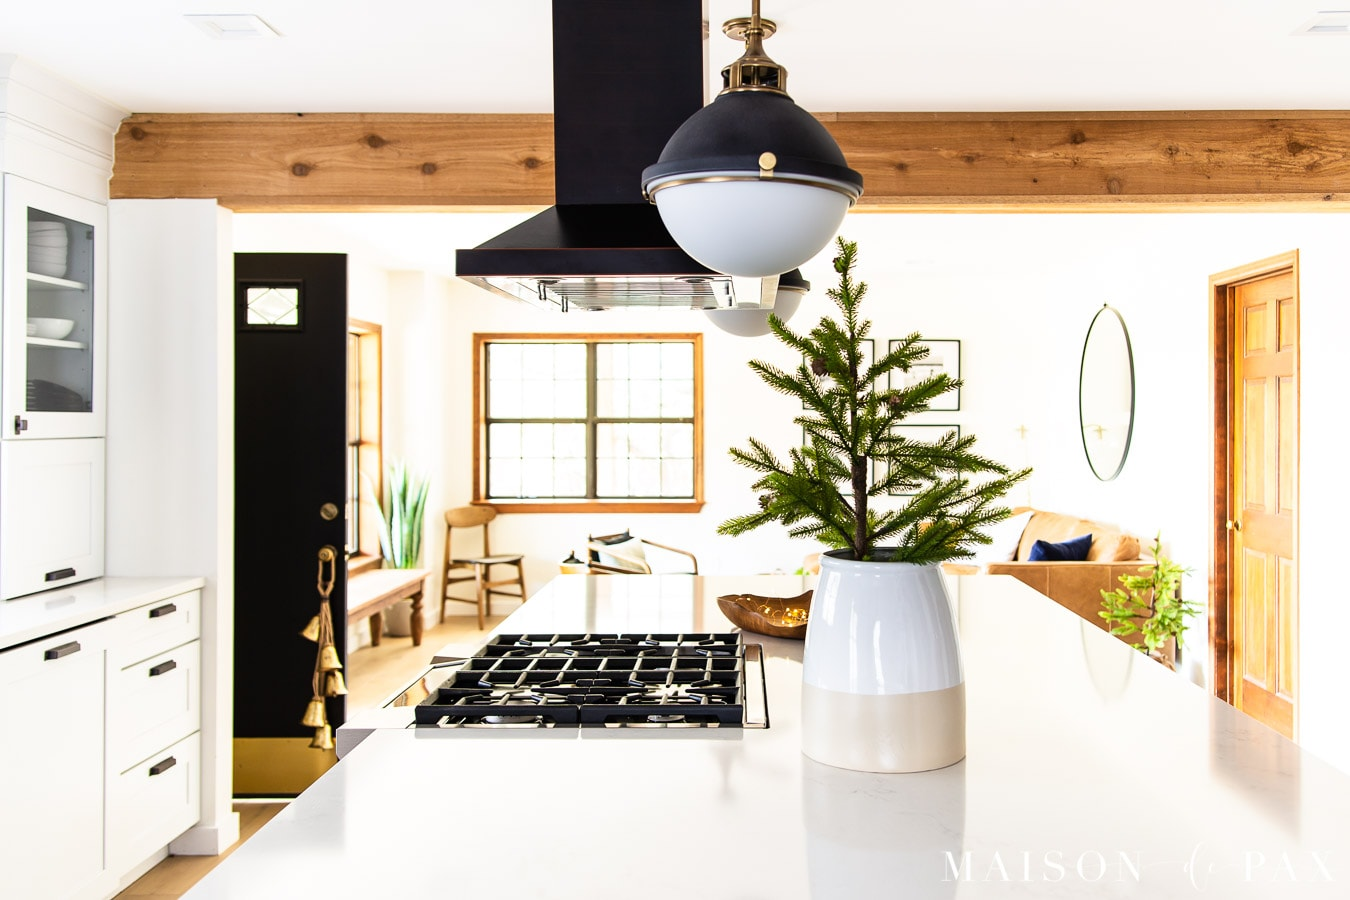 gold bells hanging on door knob and mini tree in crock on kitchen island | Maison de Pax